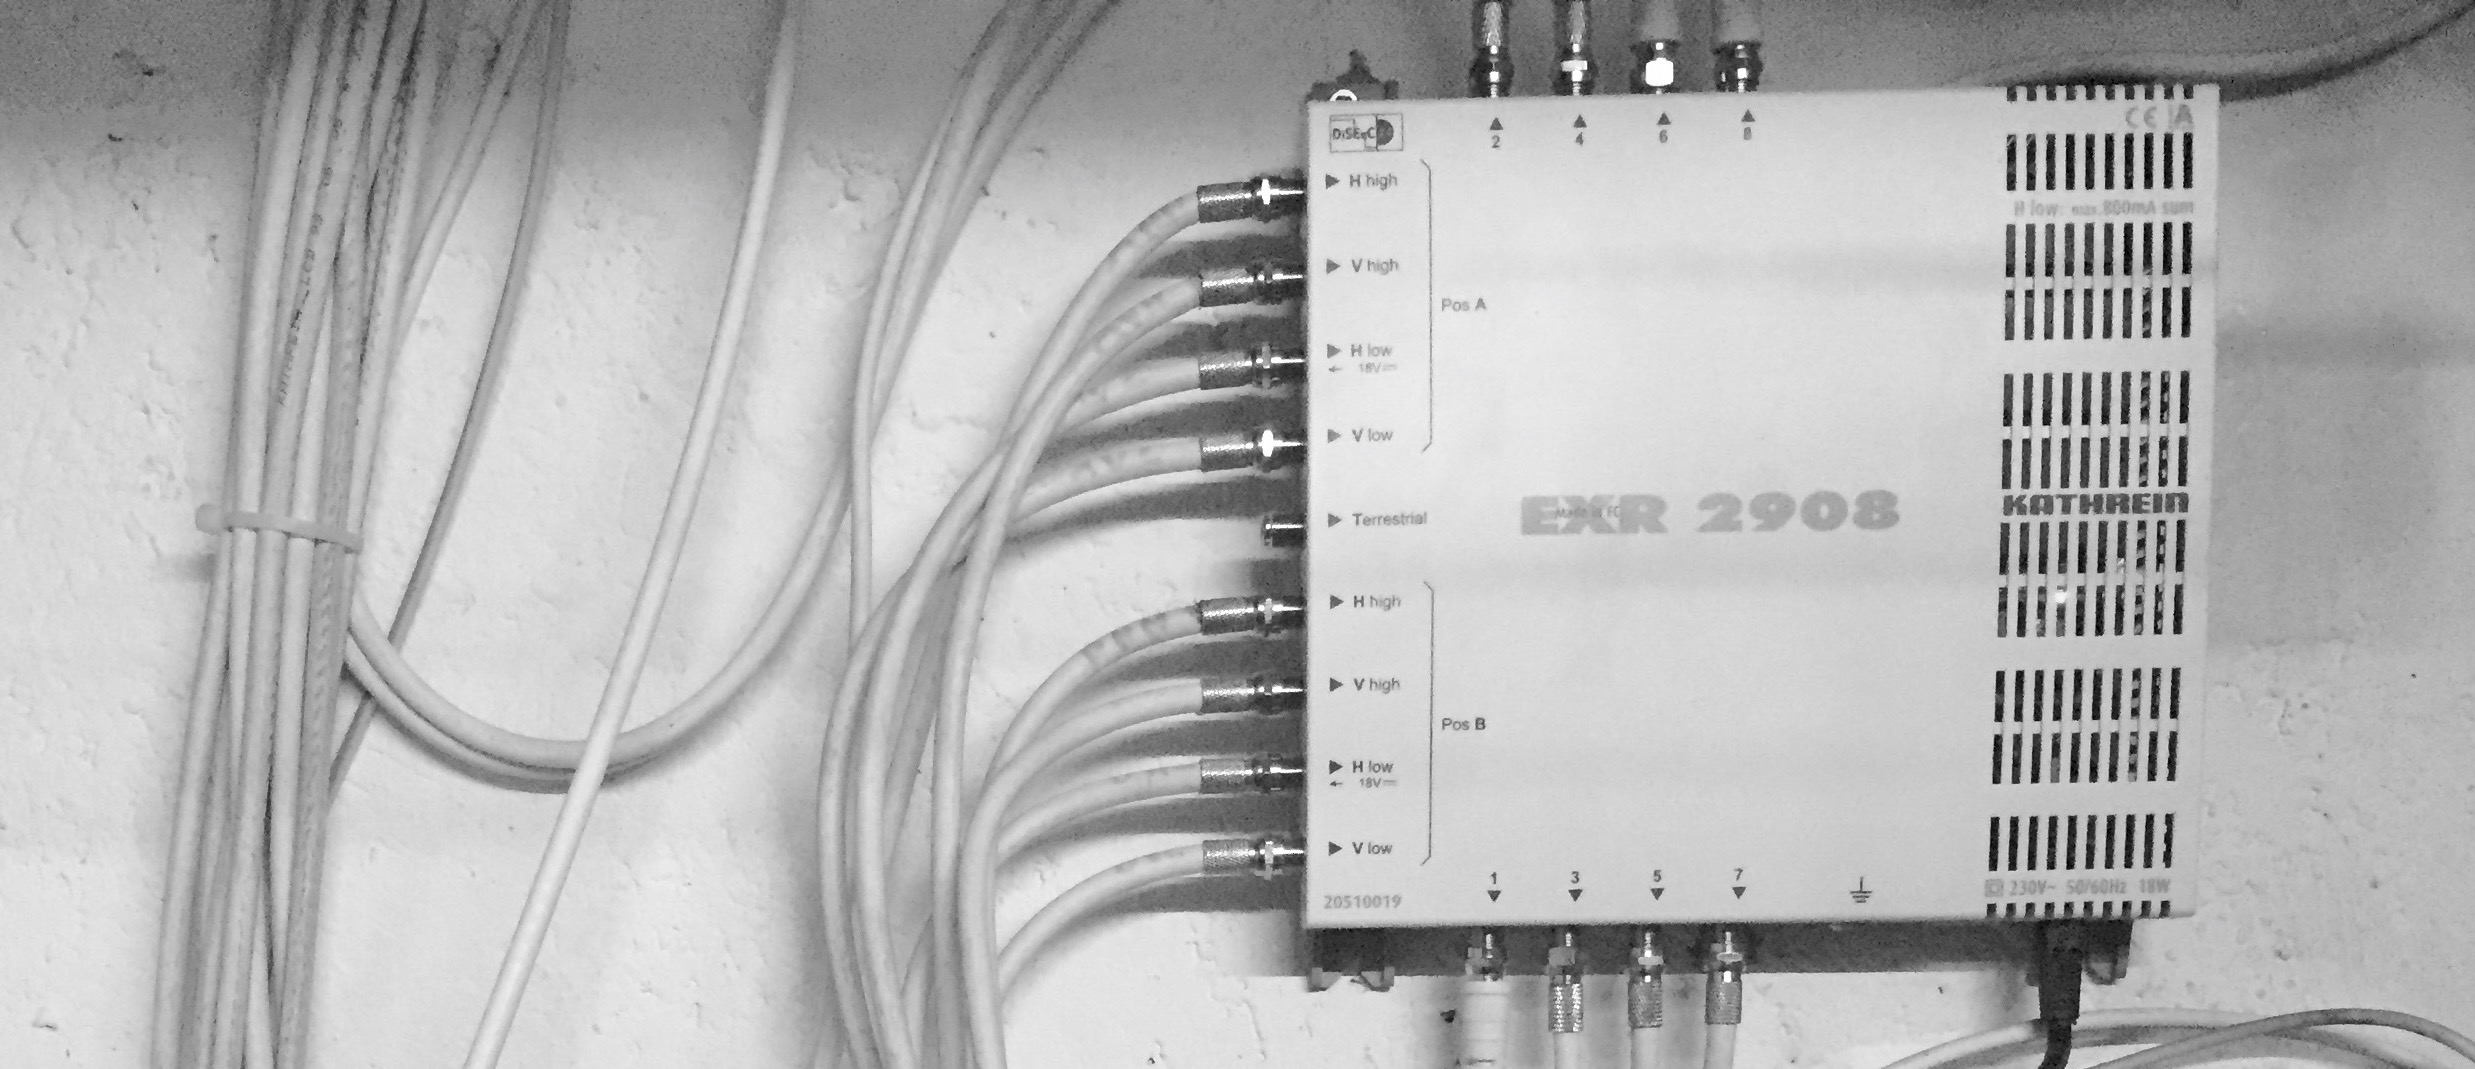 HDMI mit FullHD über Cat5, 6, 7 Verkabelung - Specialization is for ...